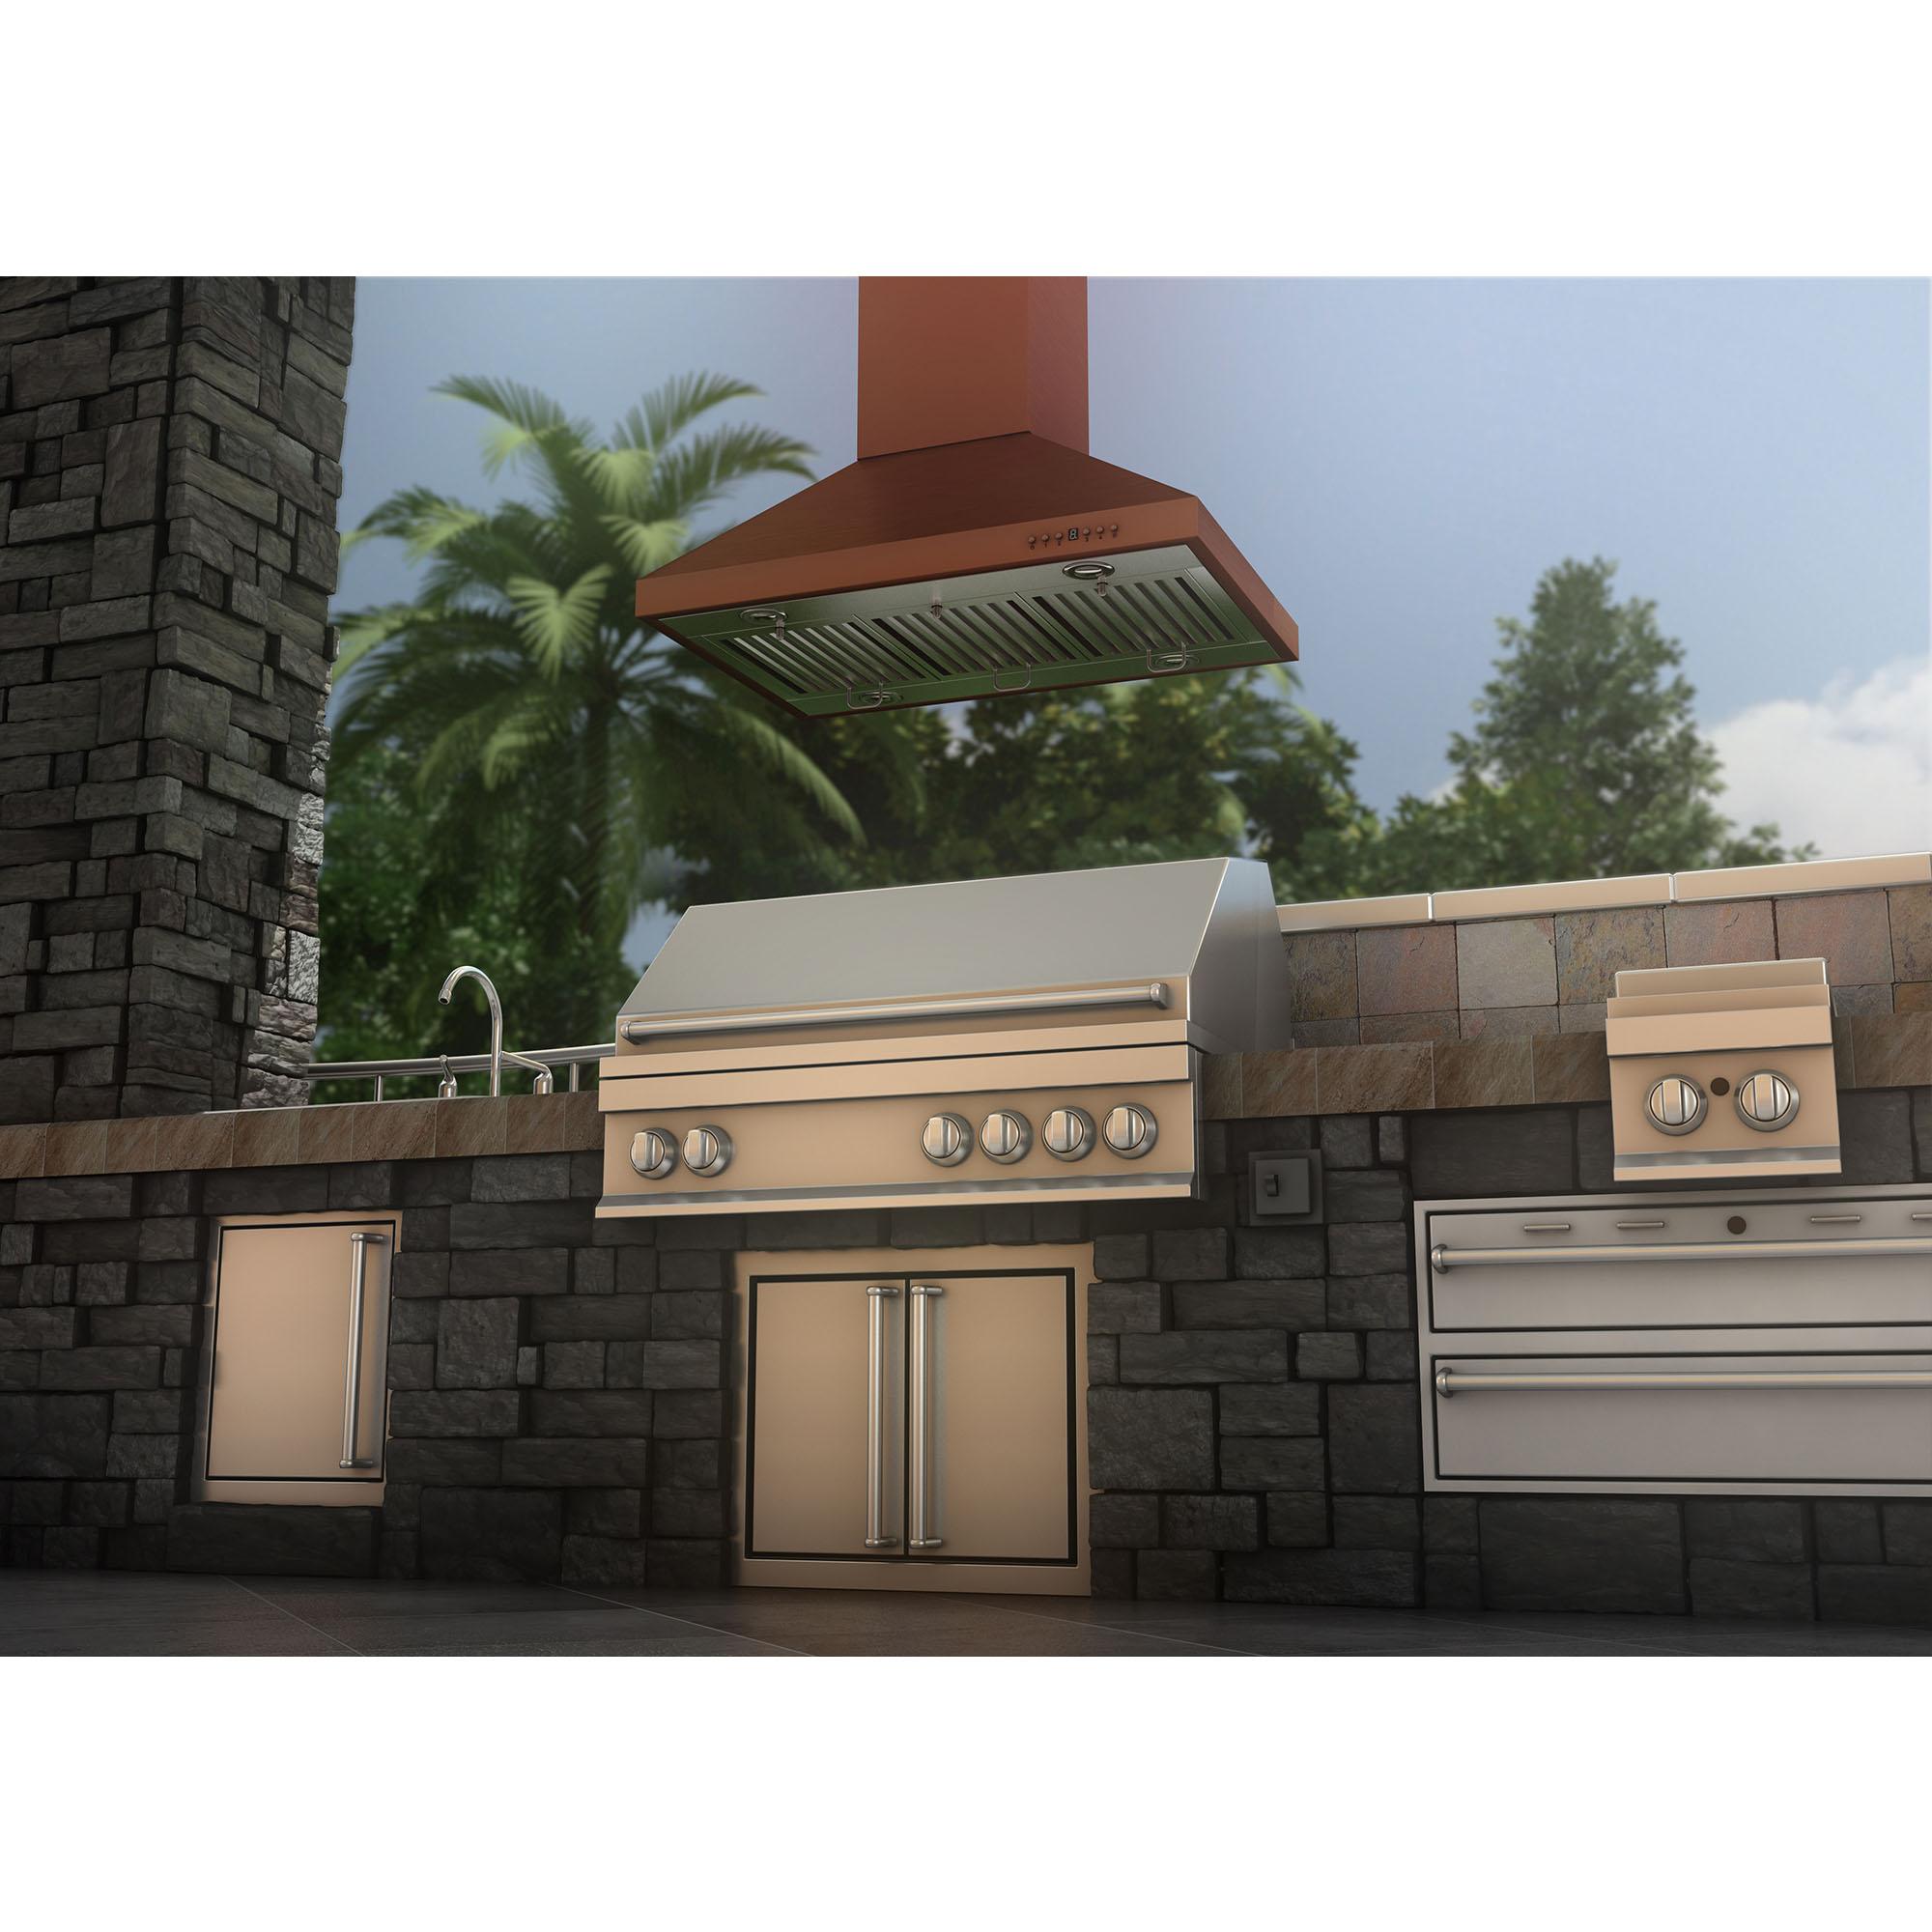 New_Copper_Island_Hood_New_Outdoor_Kitchen_Cam_03_RE.jpg